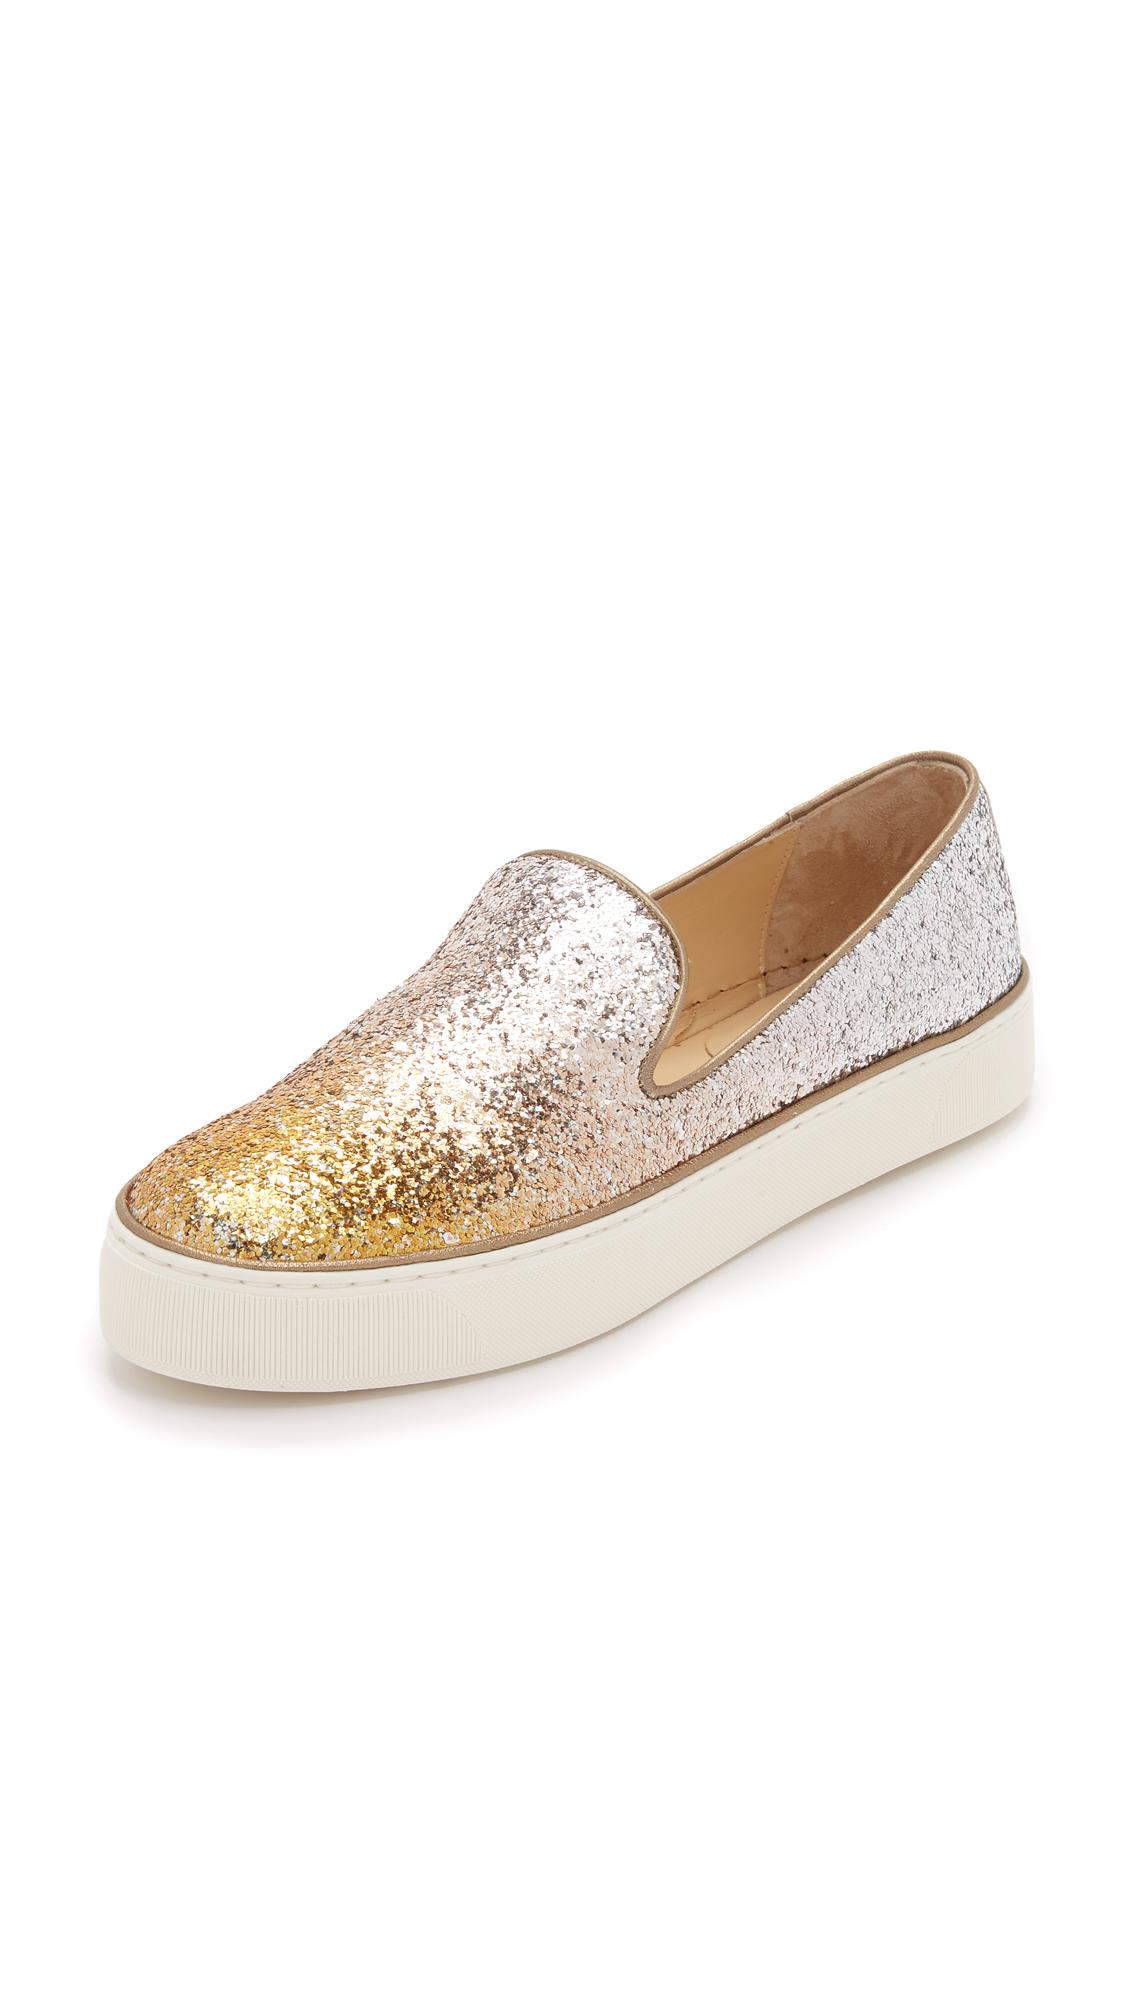 171af16bf355 Lyst - Stuart Weitzman Biarritz Glitter Slip On Sneakers in Metallic